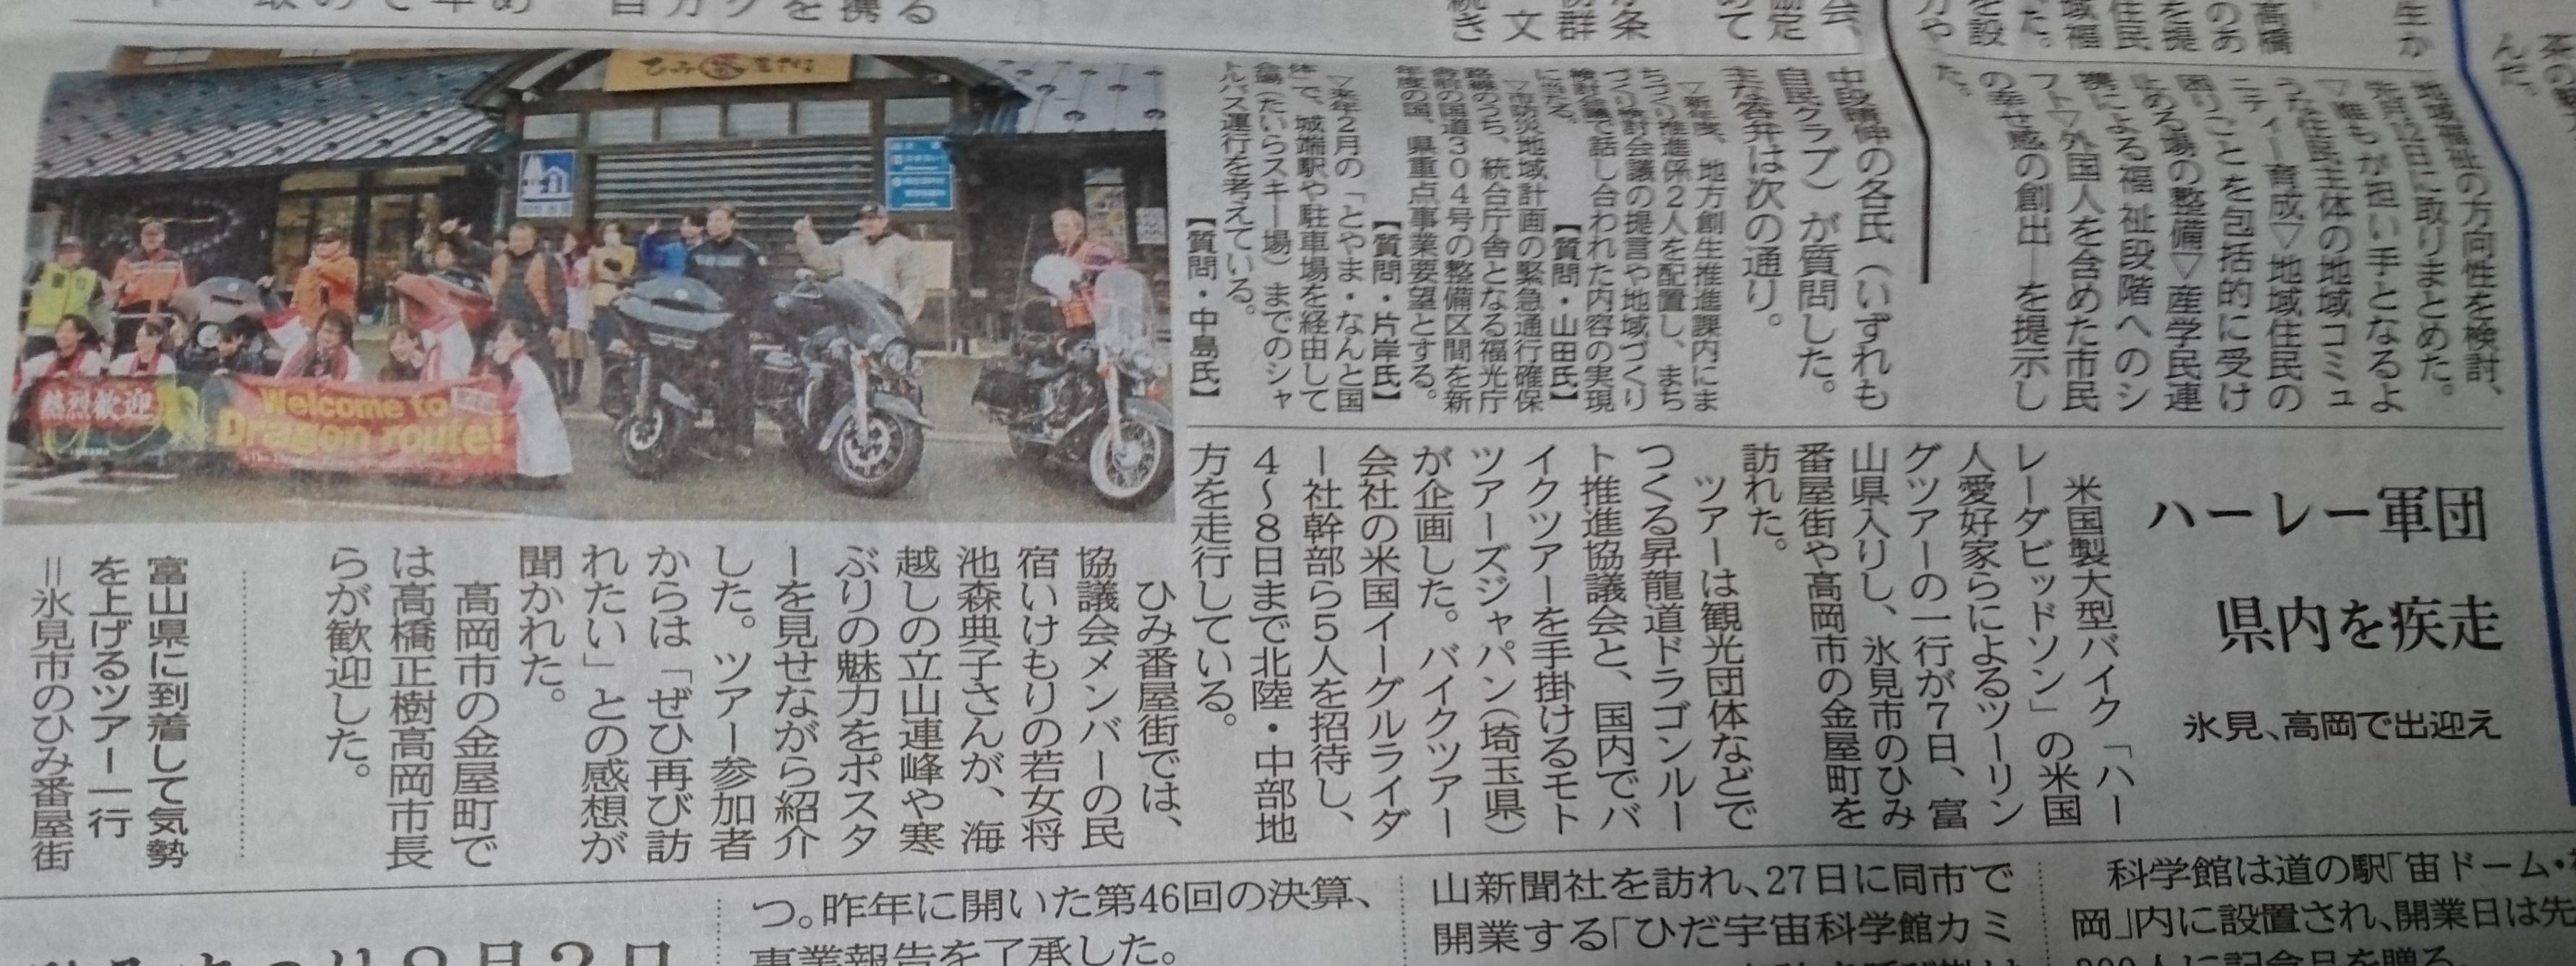 富山新聞-昇龍道ドラゴンルート推進協議会